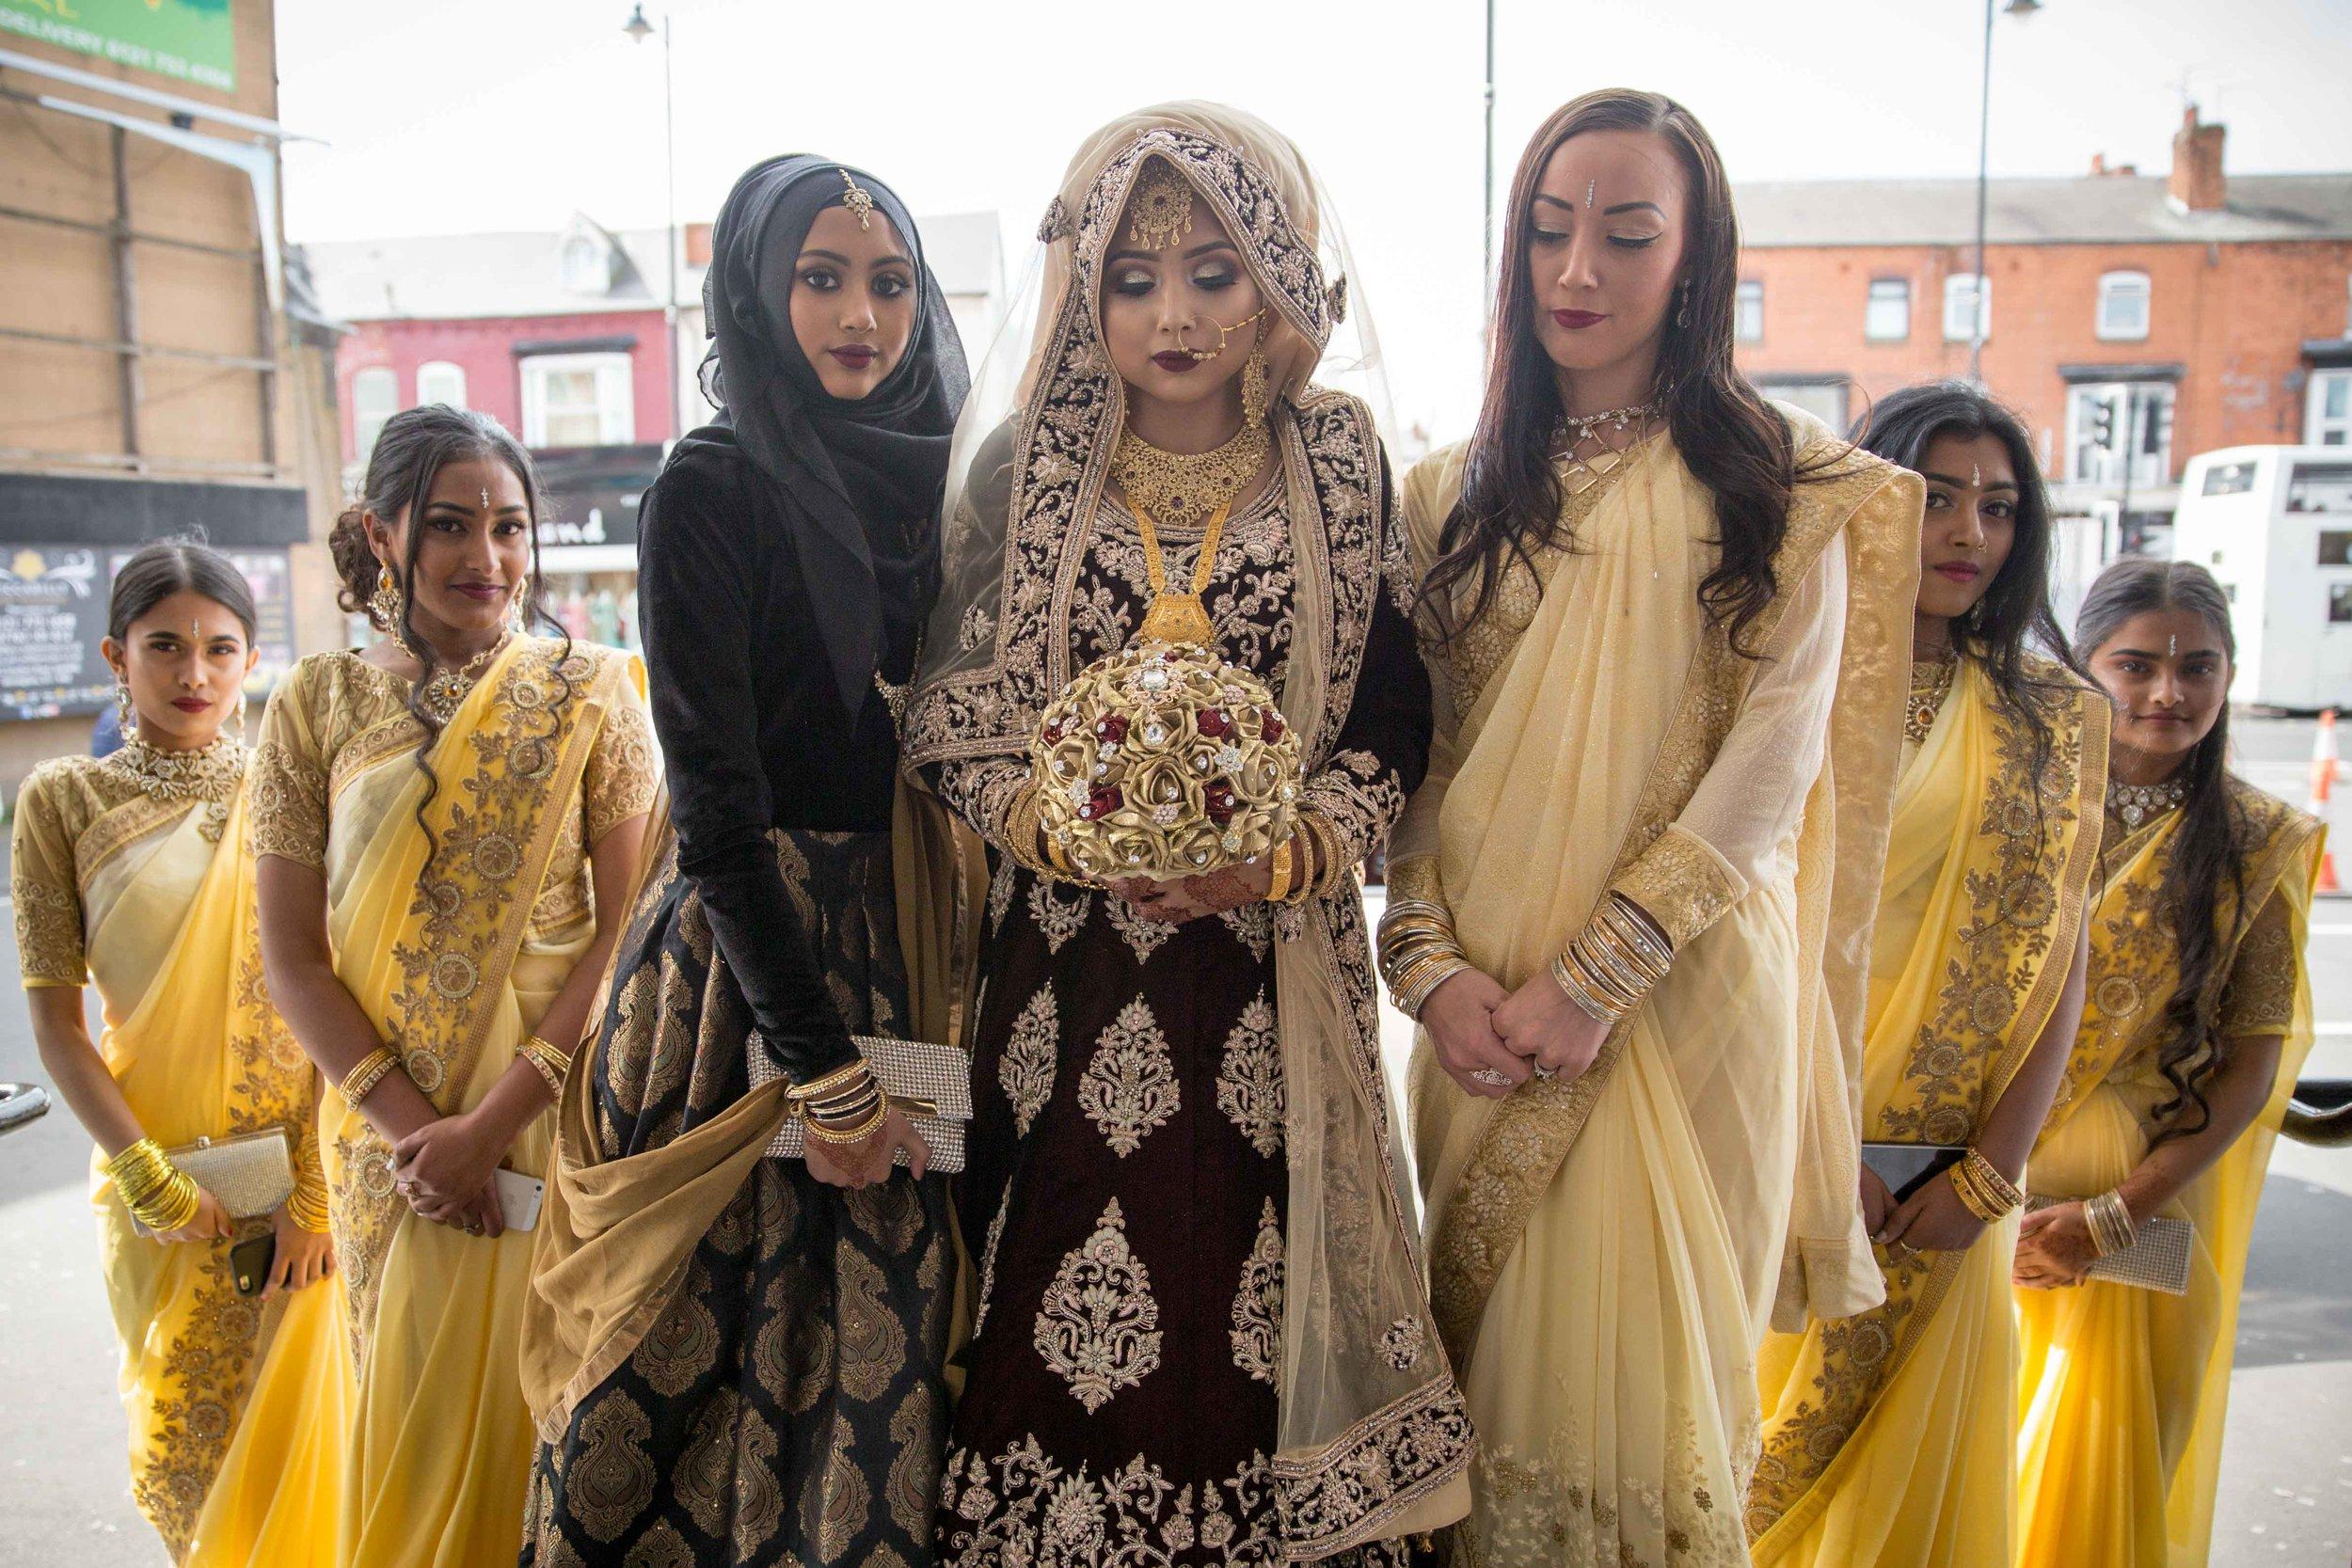 Female-Asian-Piccadilly-banqueting-suite-Wedding-Photographer-Birmingham-natalia-smith-photography-3.jpg